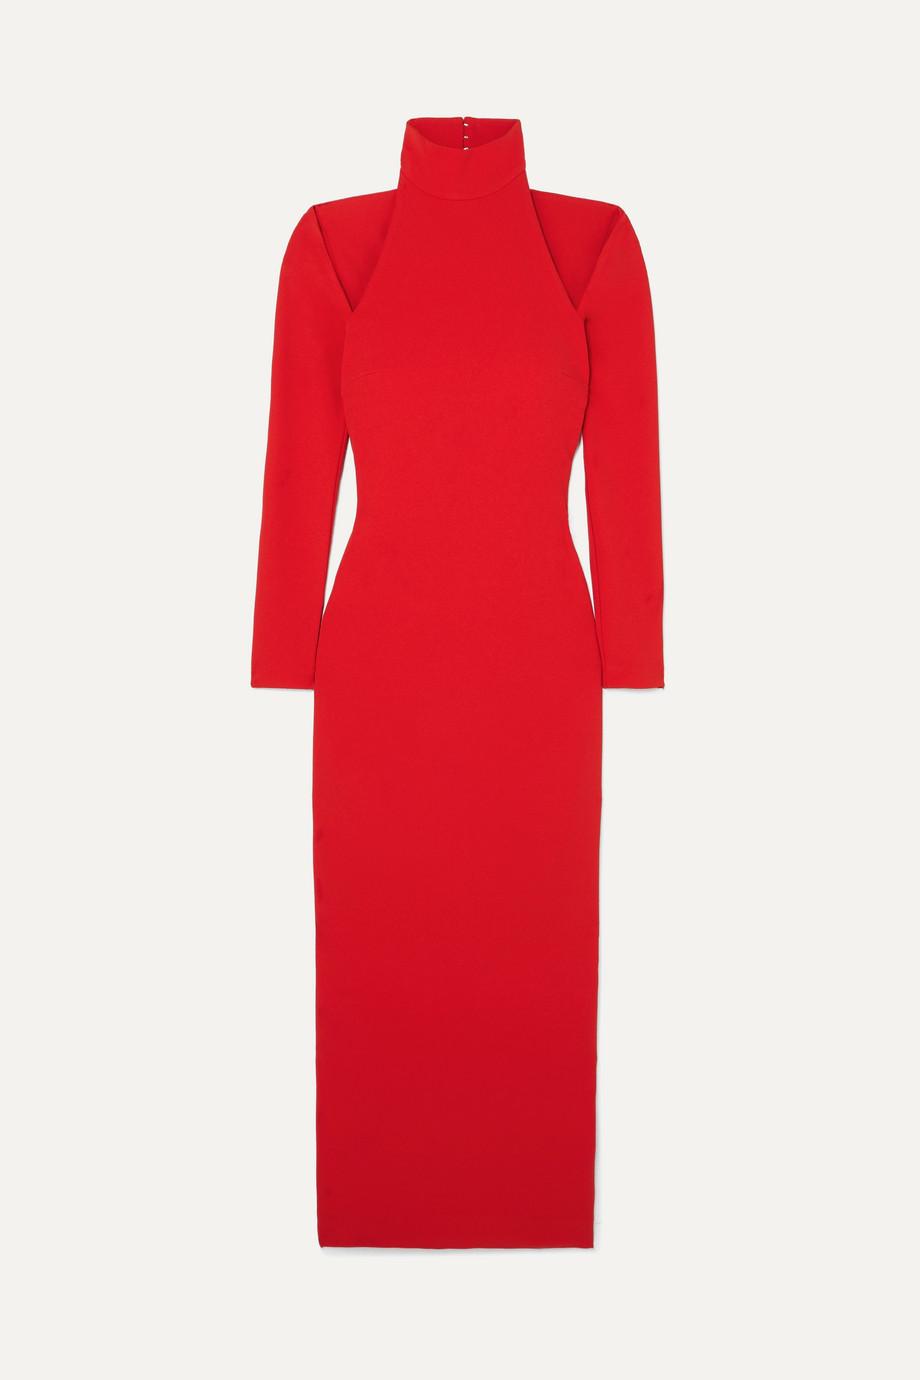 Solace London | Grayson cutout stretch-crepe midi dress | NET-A-PORTER.COM